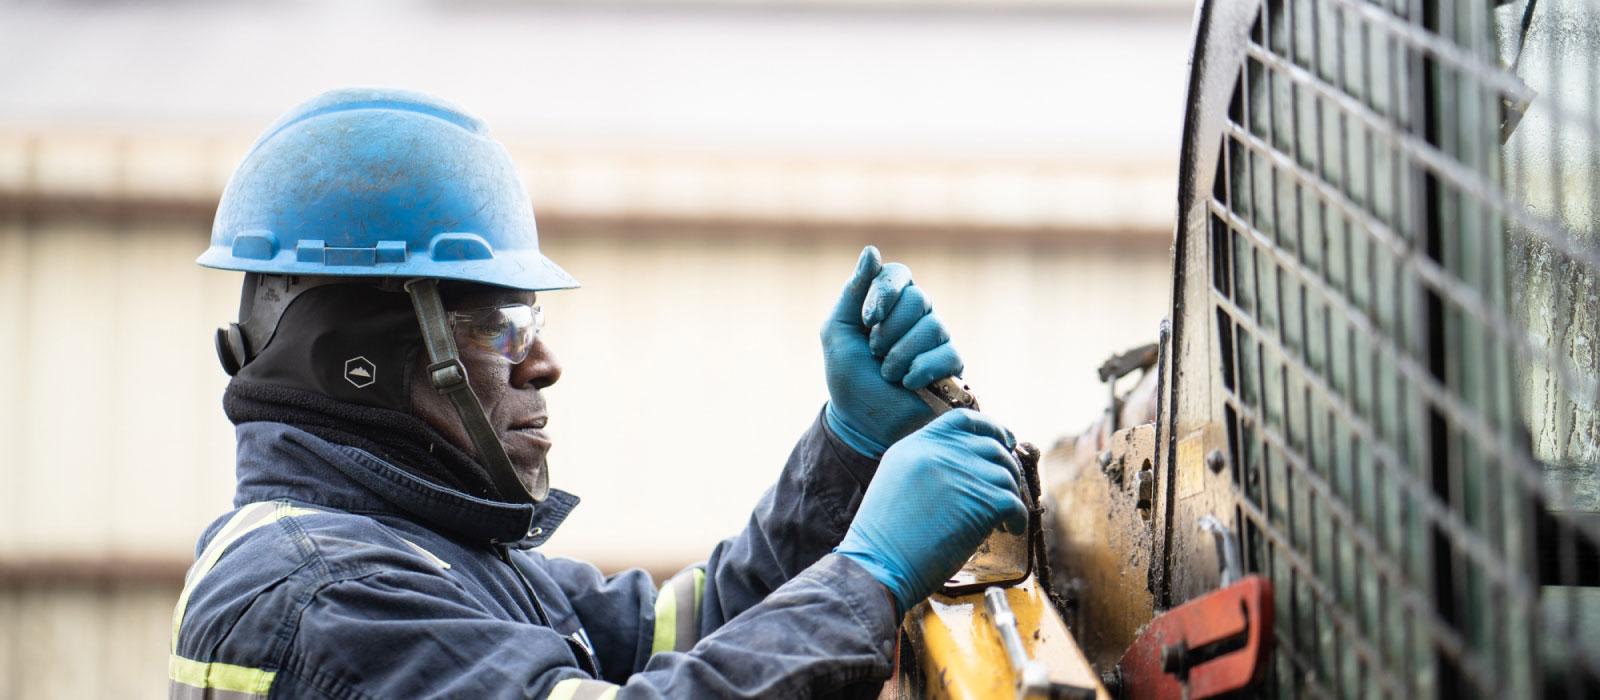 Bulk Team Member in Action Wearing Hard Hat, Safety Glasses & Gloves